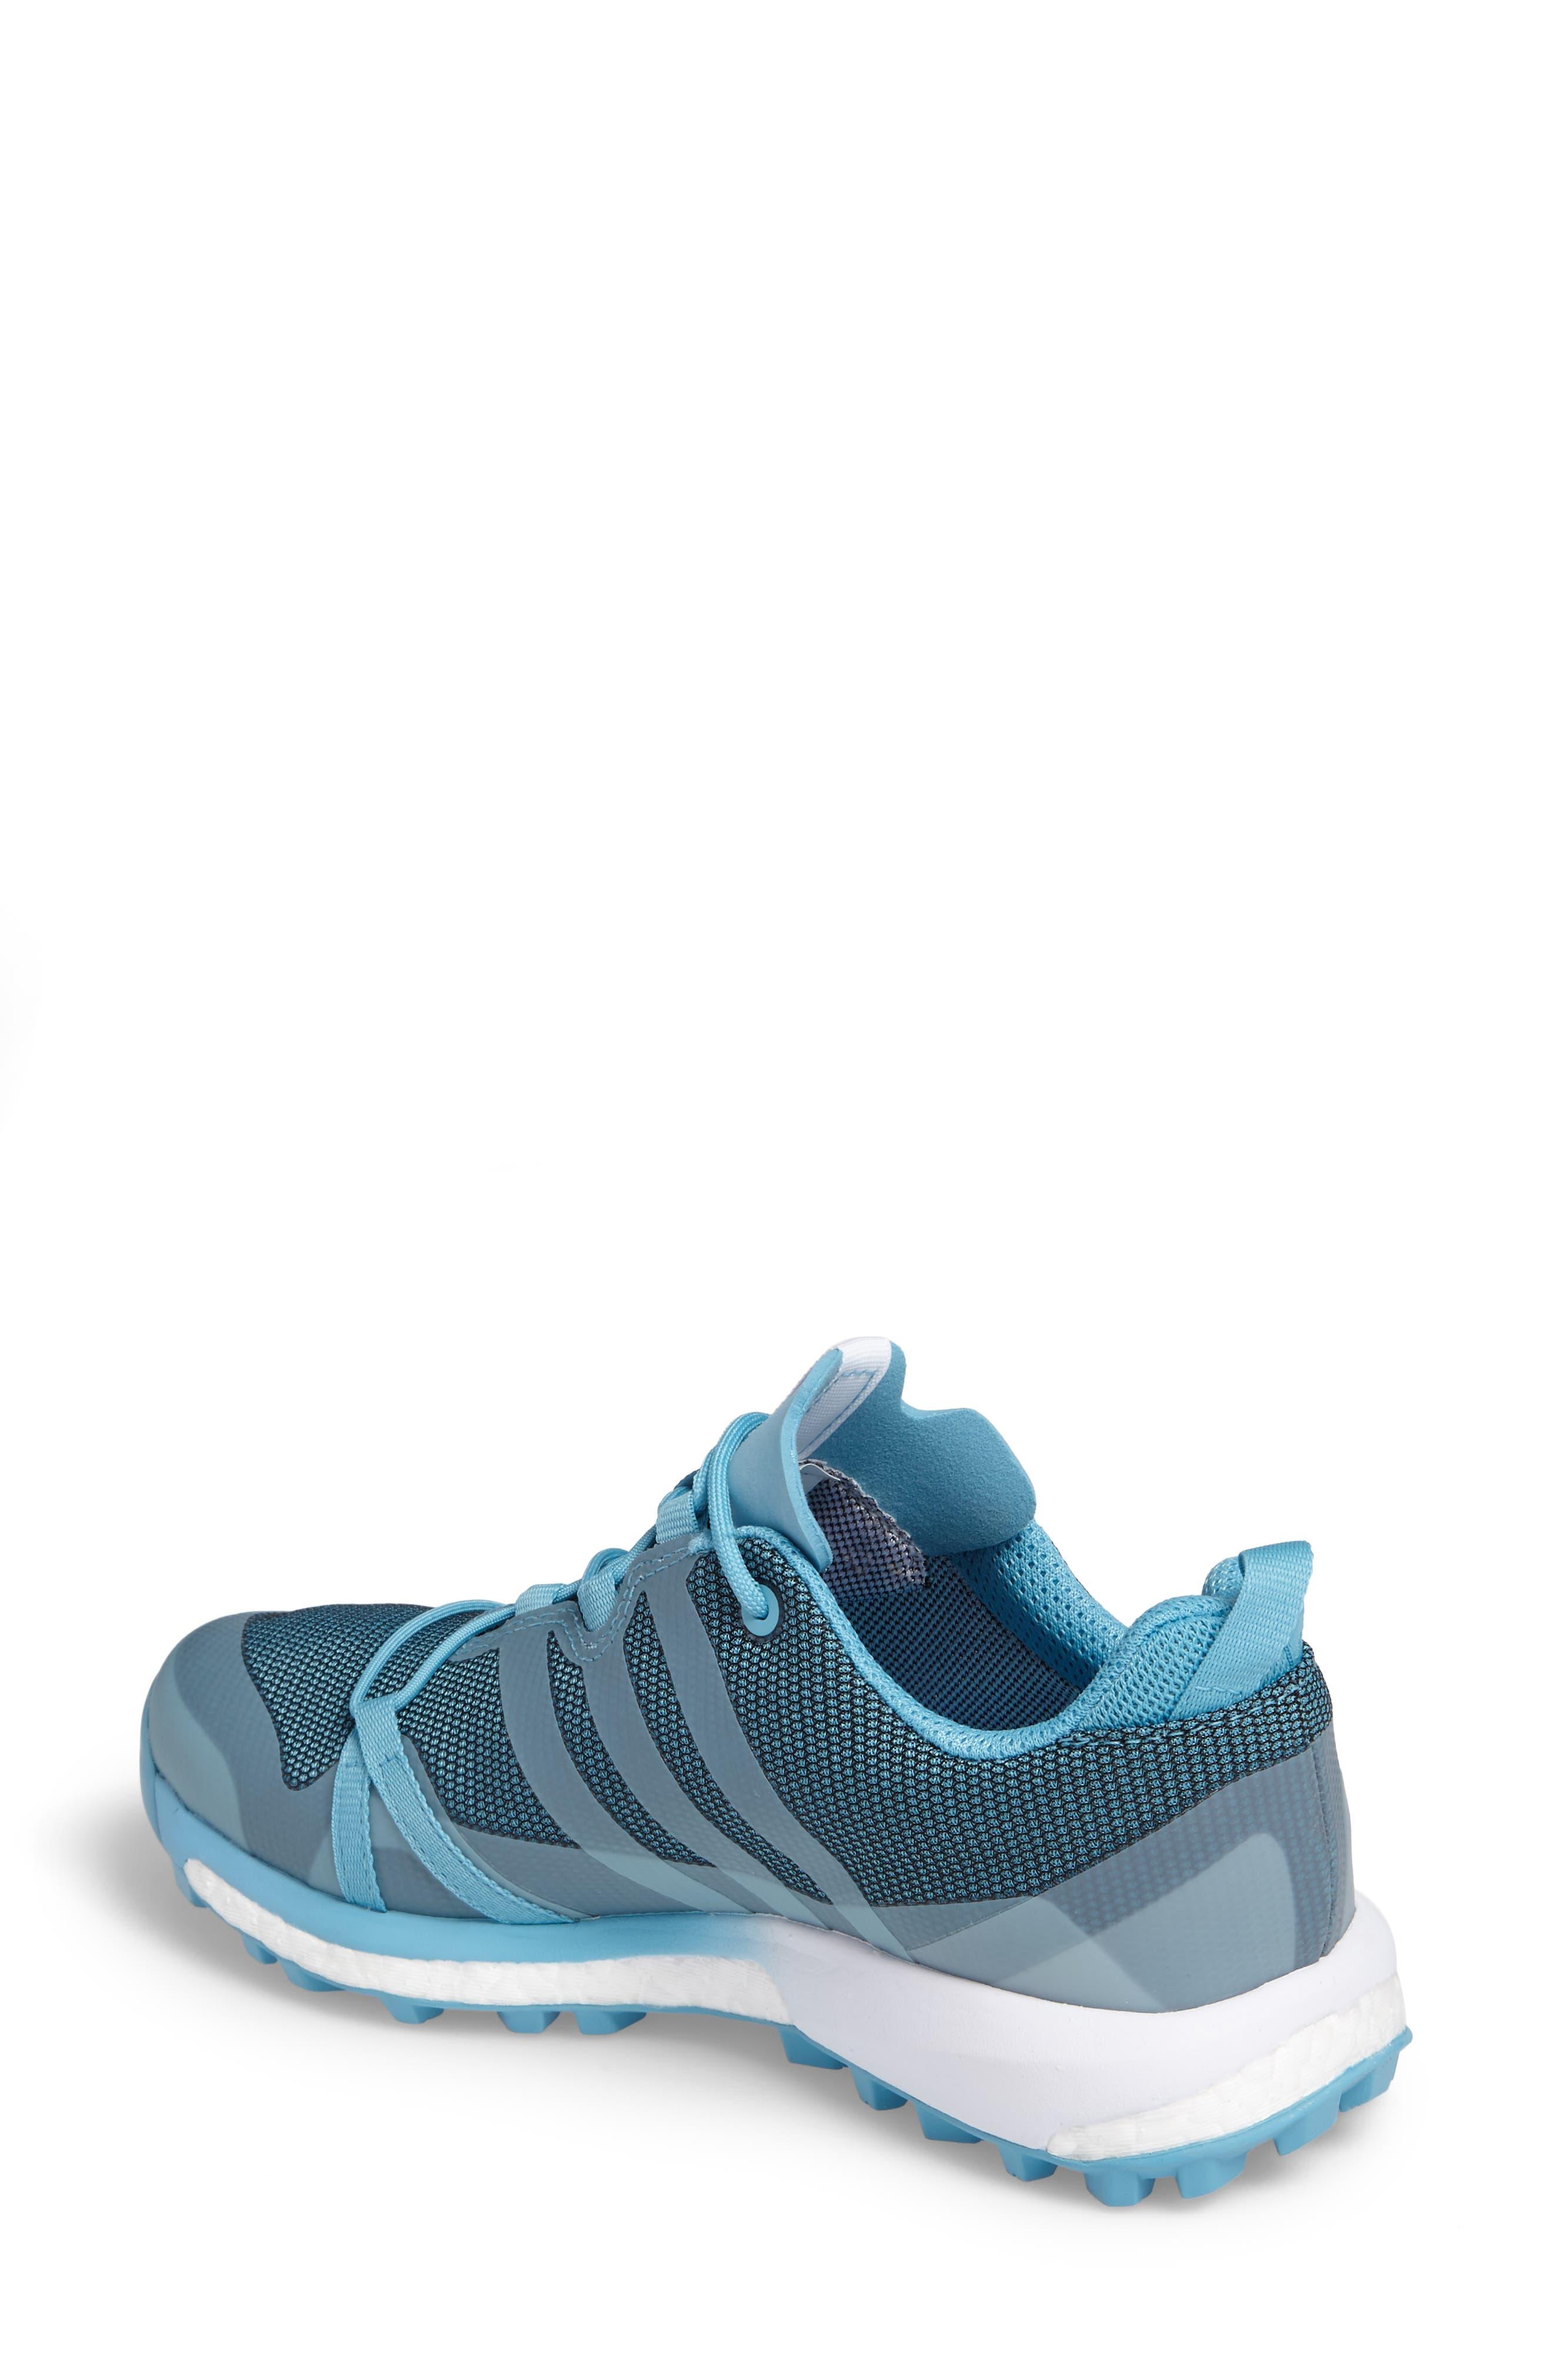 Alternate Image 2  - adidas 'Terrex Agravic GTX' Trail Shoe (Women)